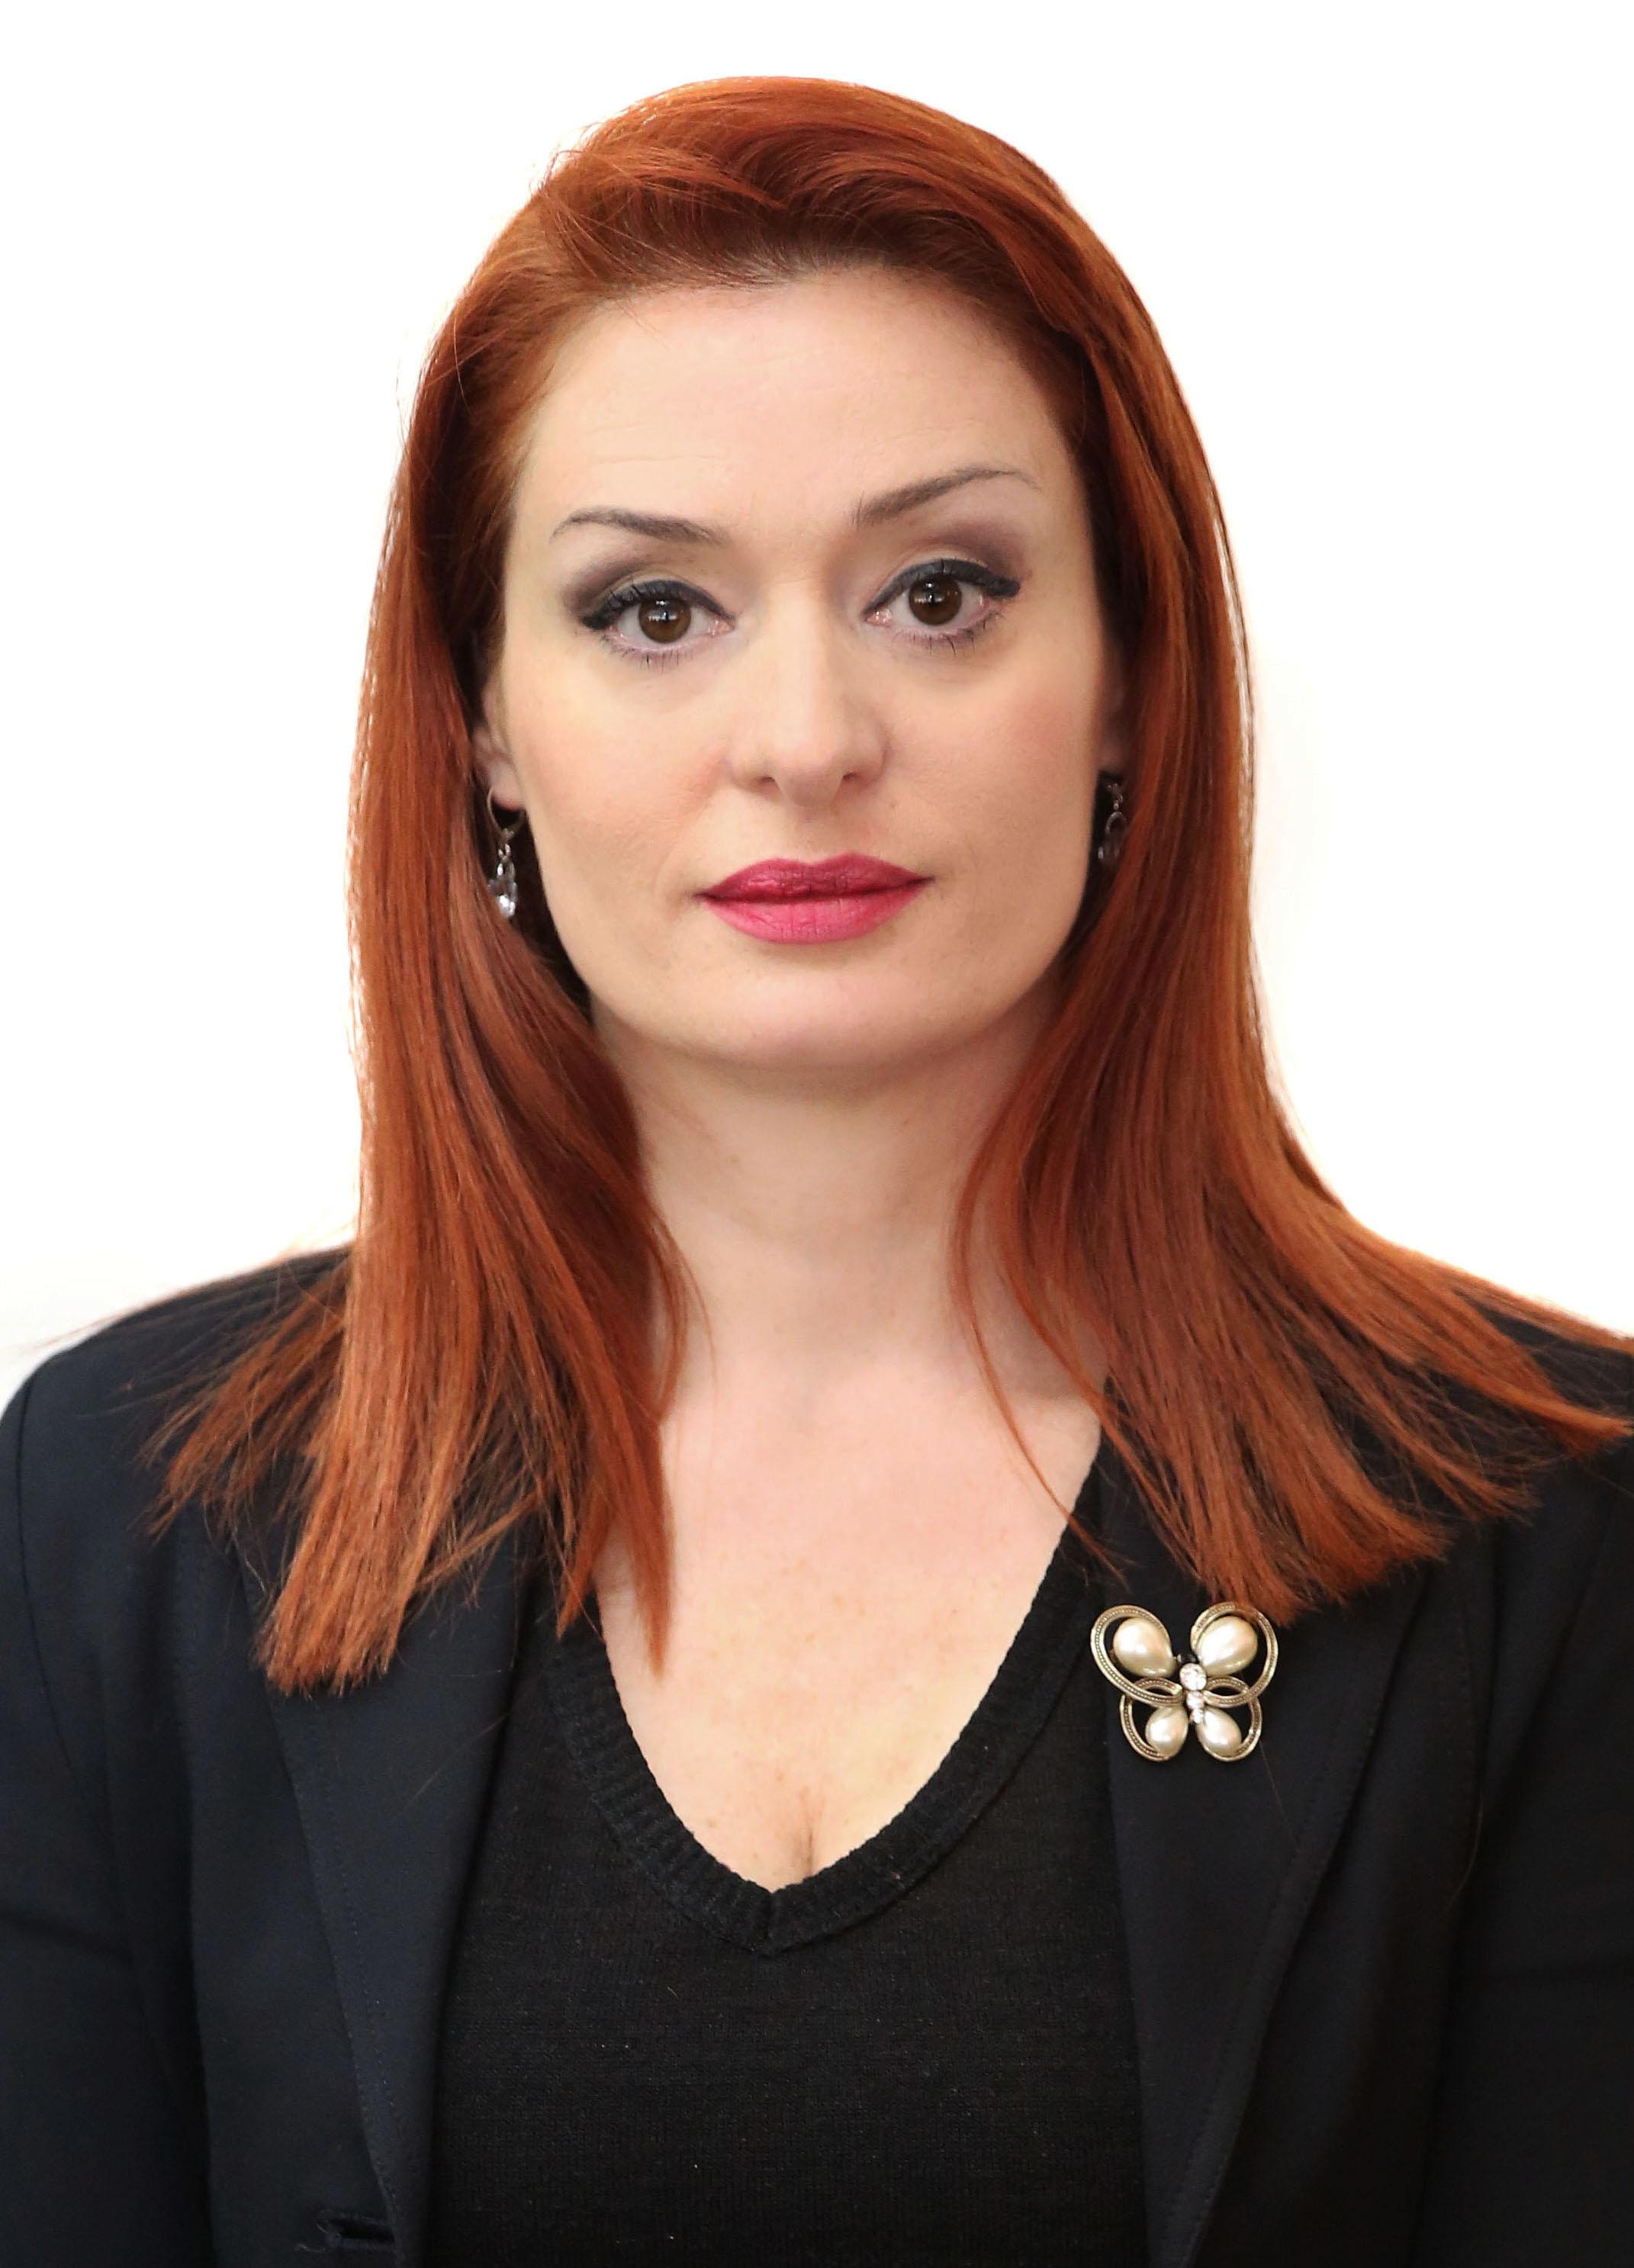 Krasniqi